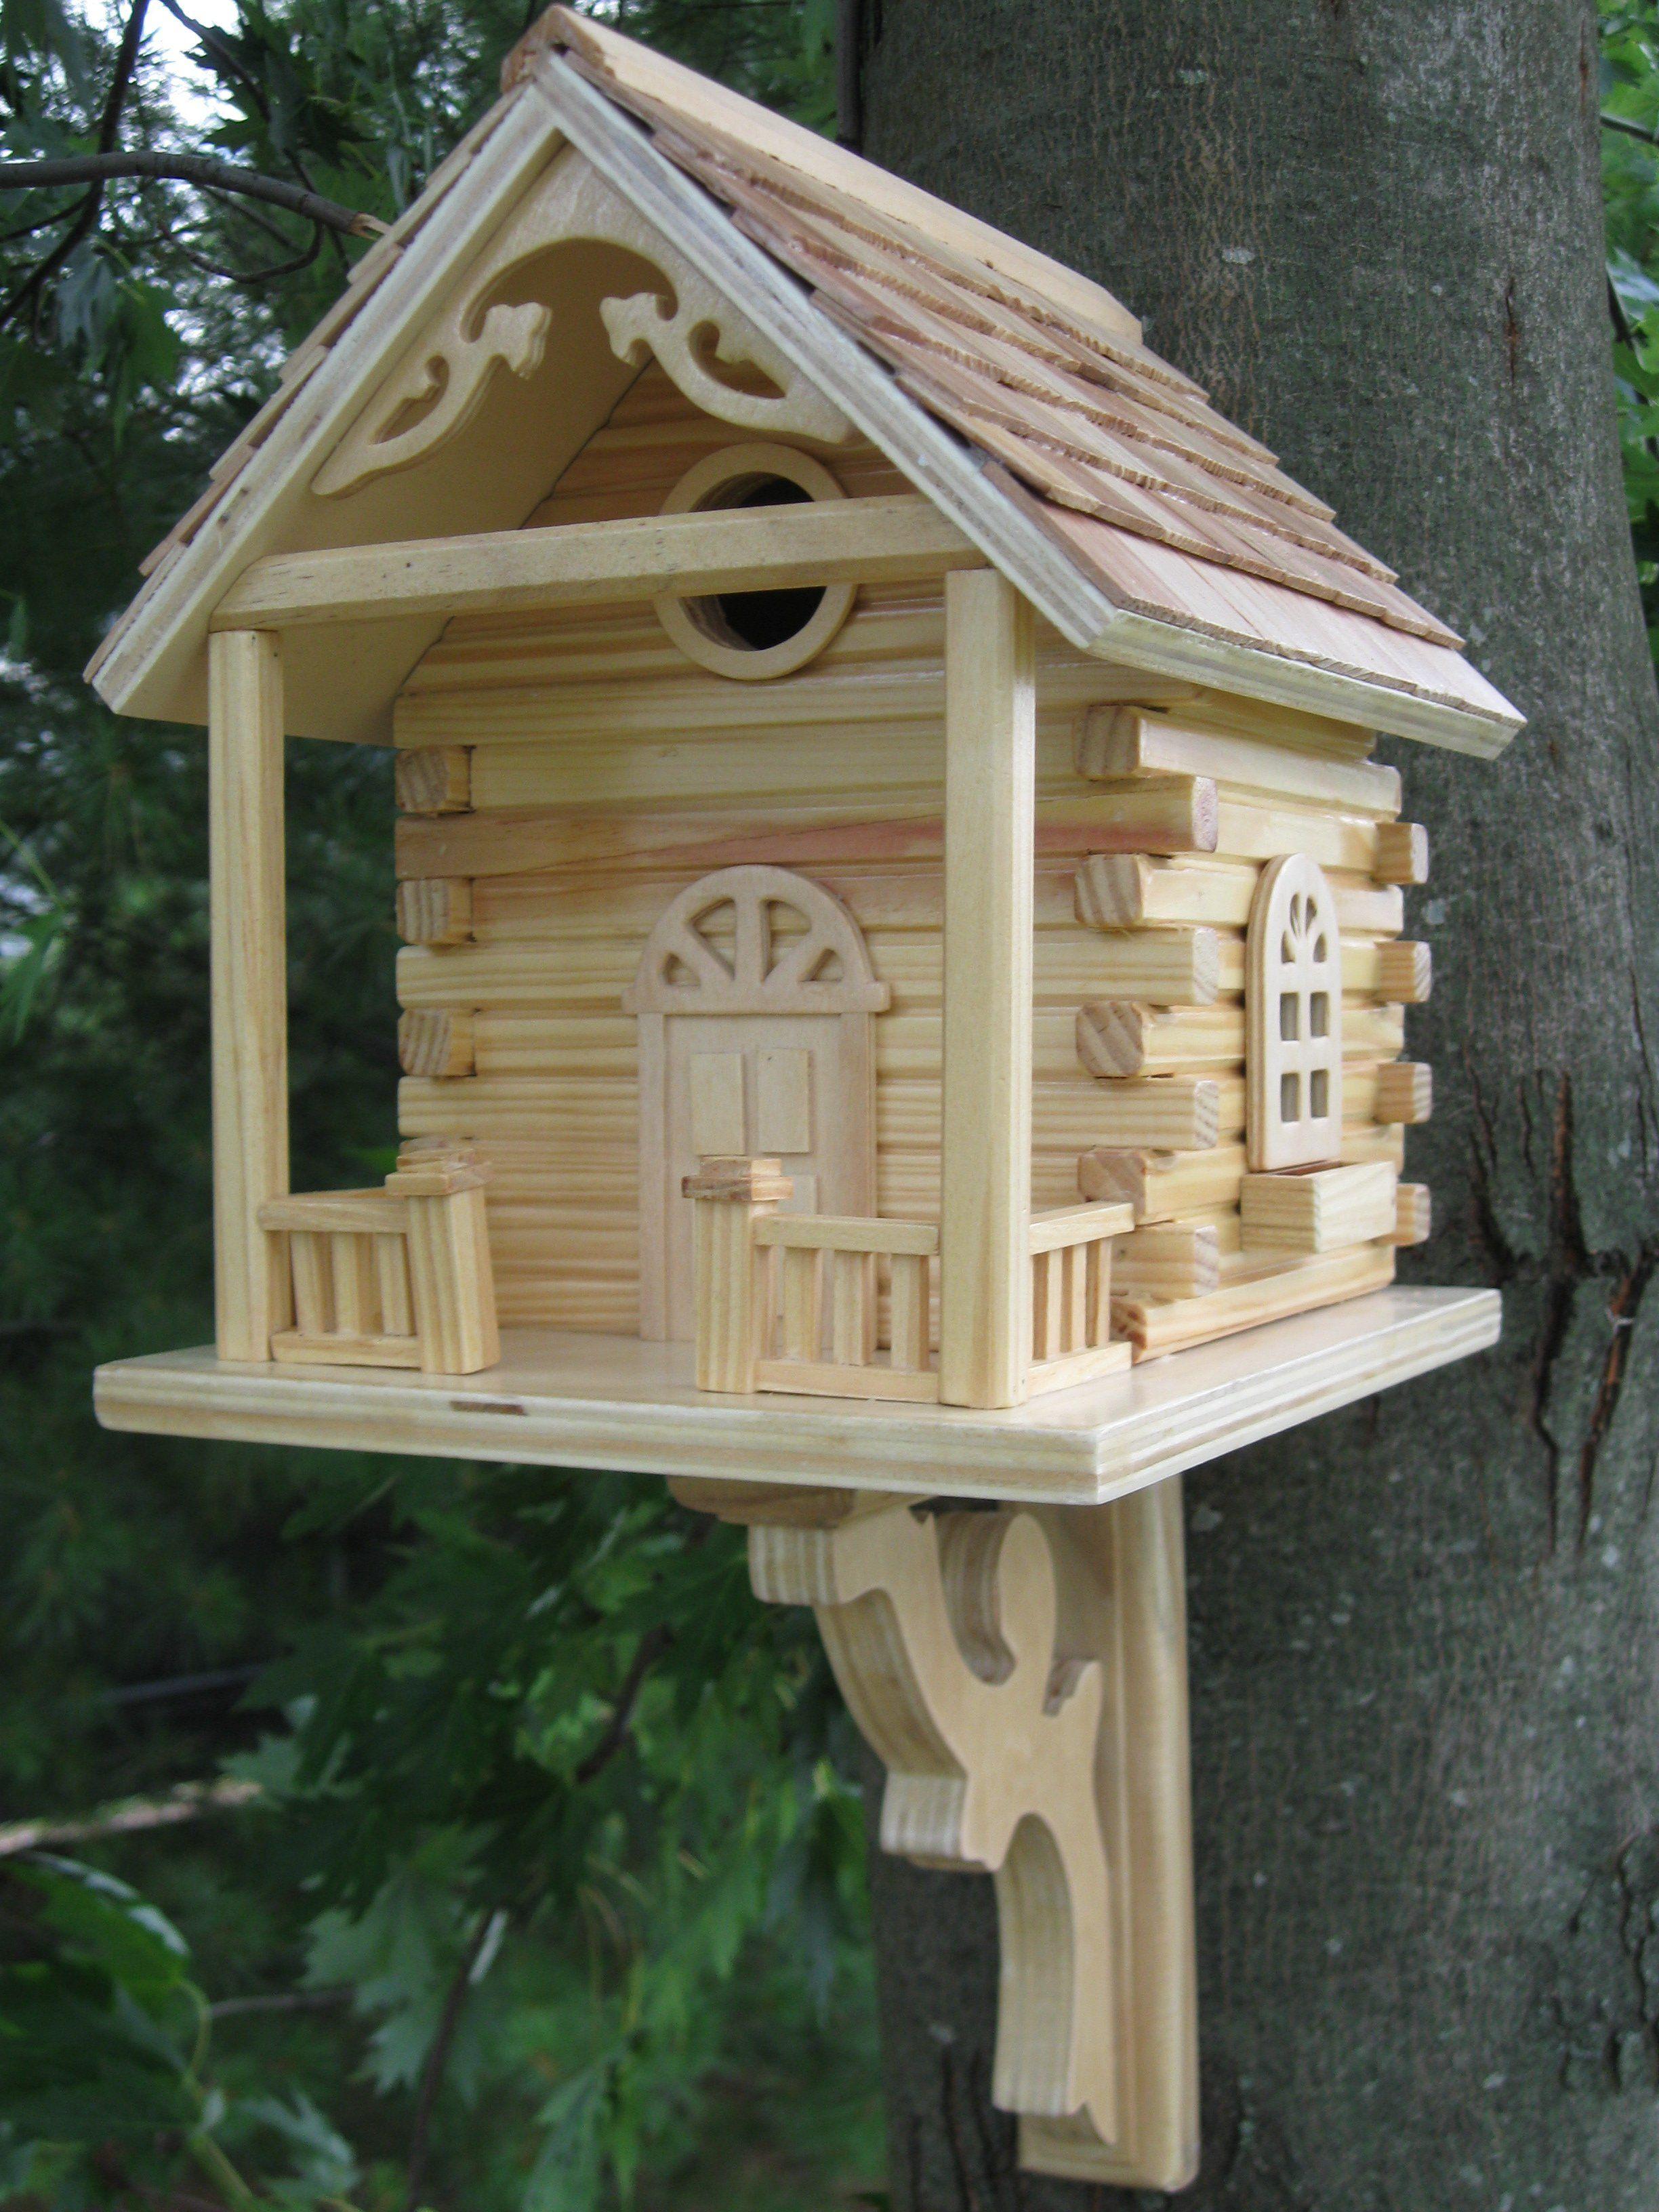 Cabin Birdhouse-Natural | Bird house plans, Decorative bird ... on cardinal bird house designs, different bird house designs, cute bird house designs, wooden bird house designs, homemade bird house designs, easy bird house designs,